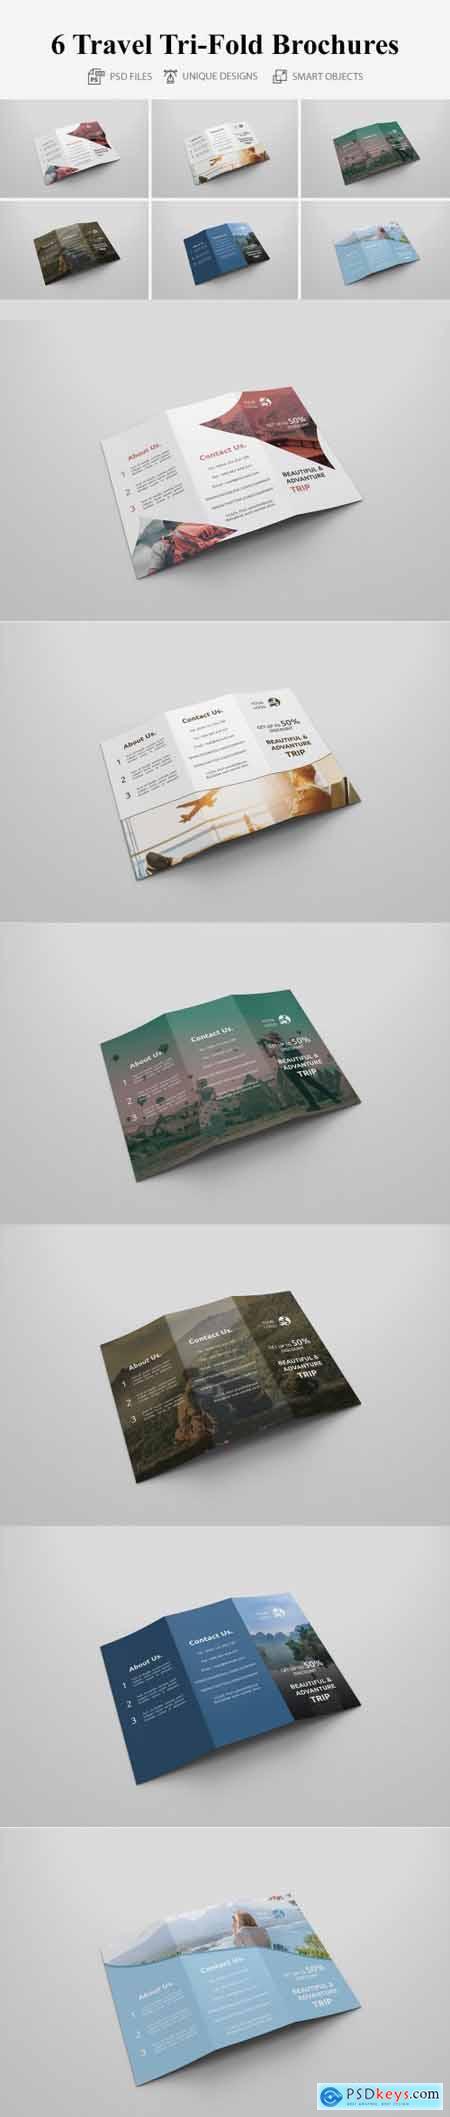 Travel Tri-fold Brochures 4401680